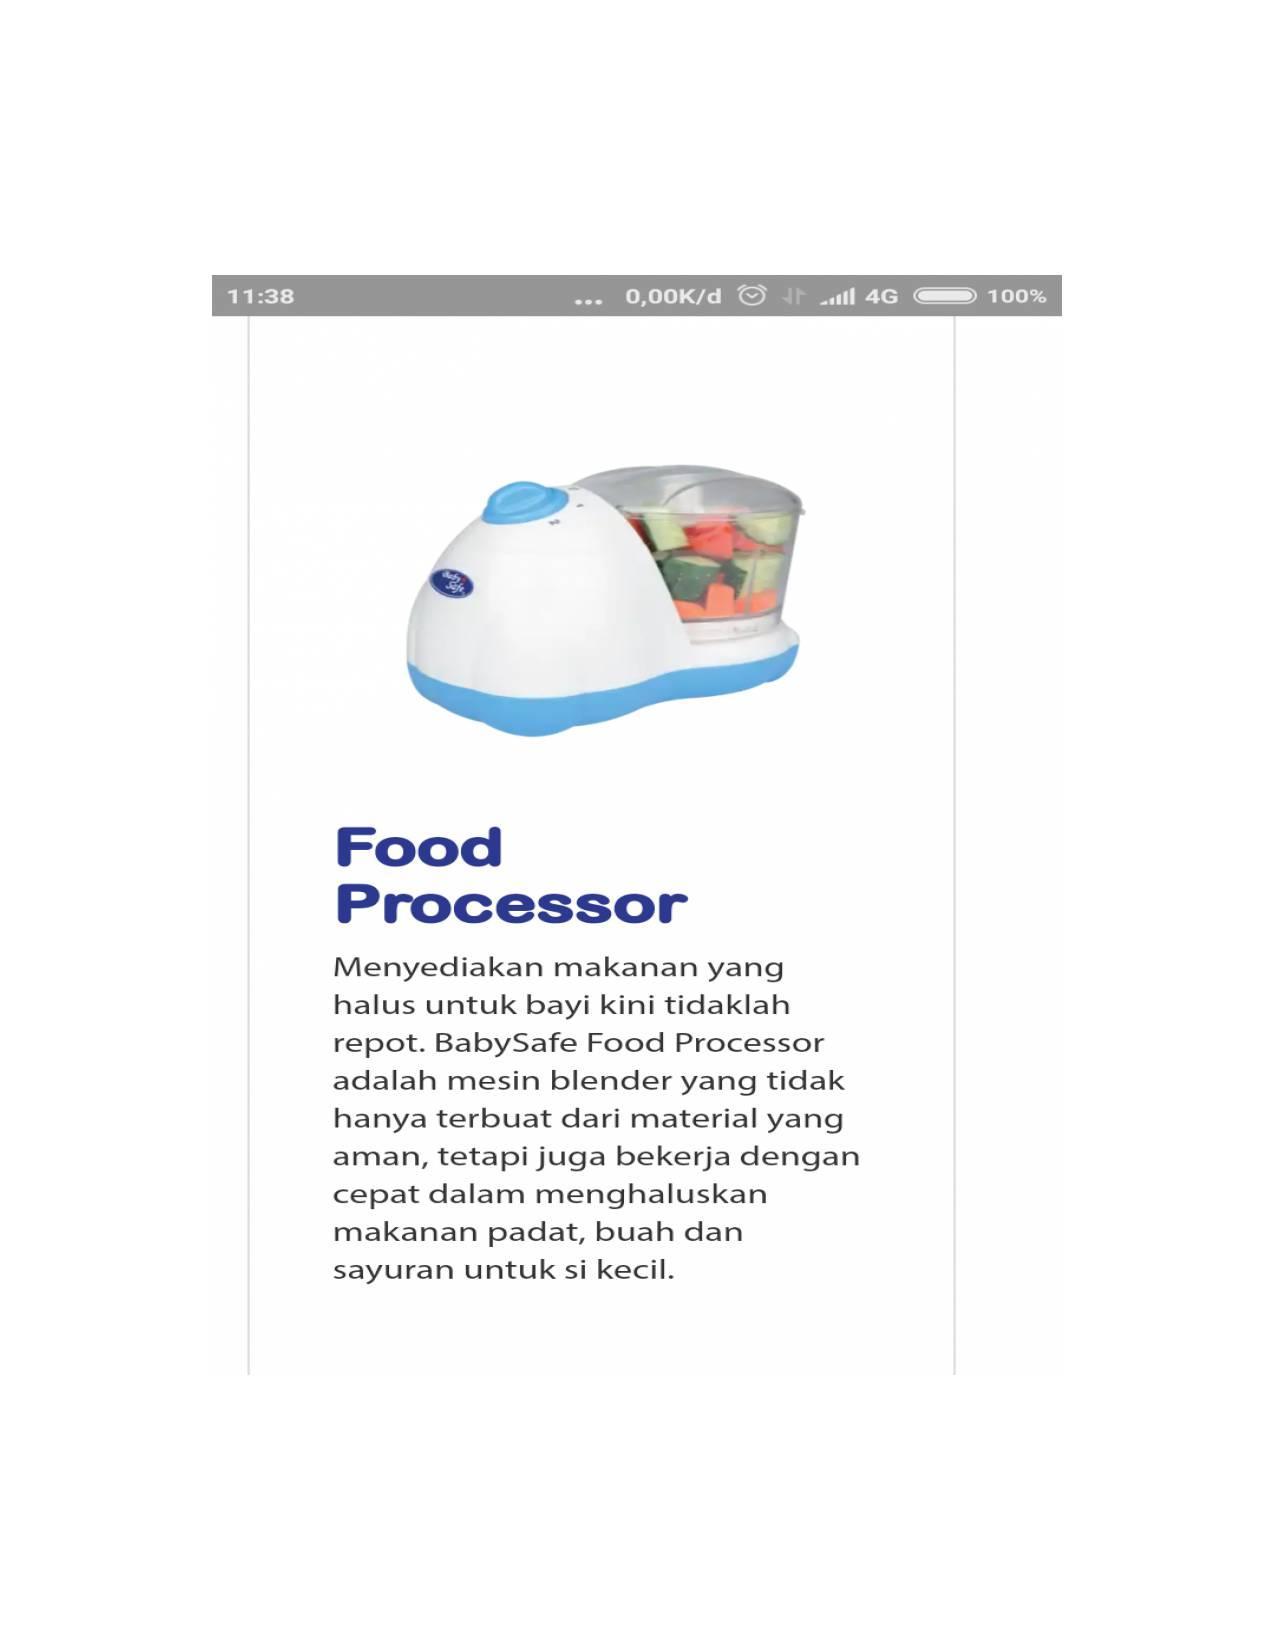 Baby Safe Smart Food Processor Bsw002 Cek Harga Terkini Dan Maker Babysafe Steam Blender Prosesor Lb 609